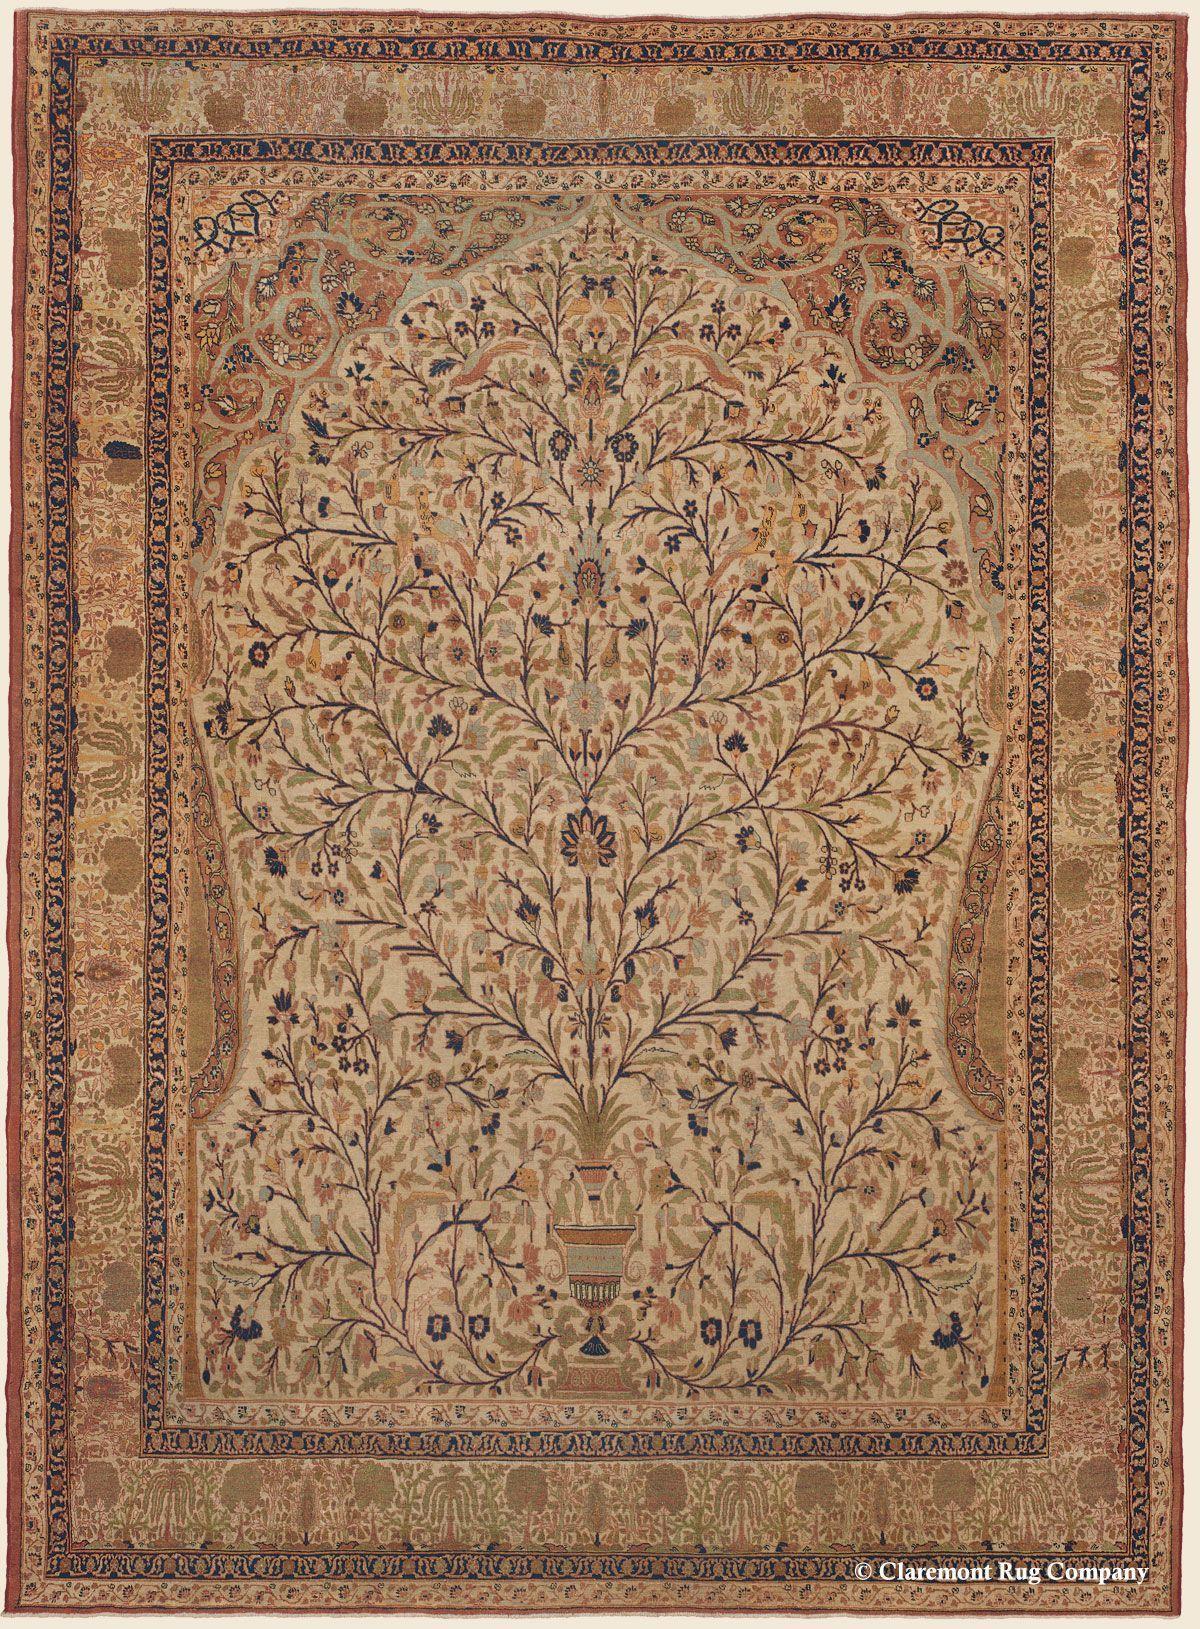 Hadji Jallili Haji Jalili Tabriz Rugs Claremont Rug Company Antique Persian Carpet Persian Carpet Rugs On Carpet